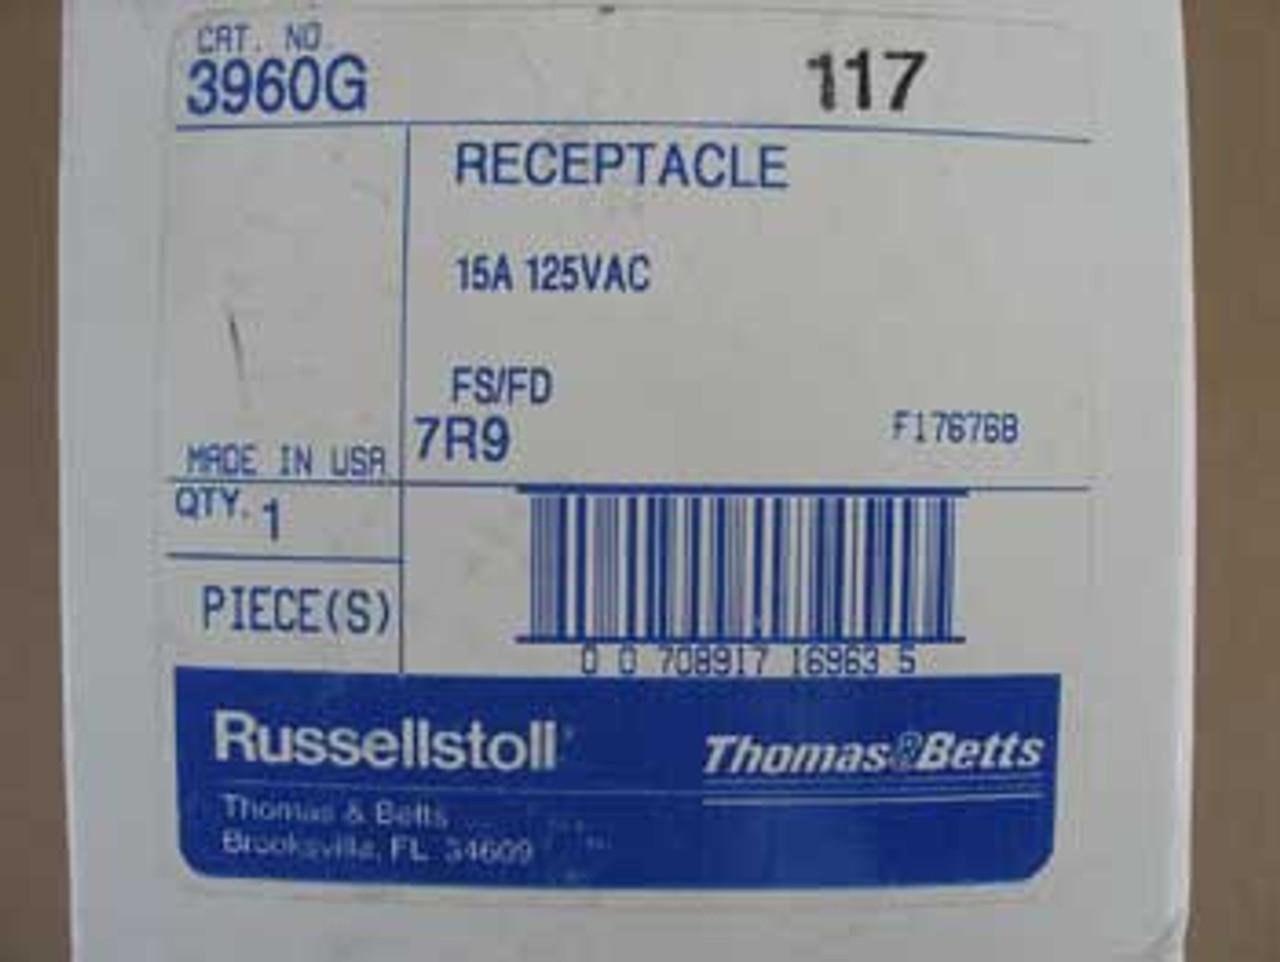 Russellstoll 3960G 15A 125VAC Cast Aluminum Duplex Receptacle - New